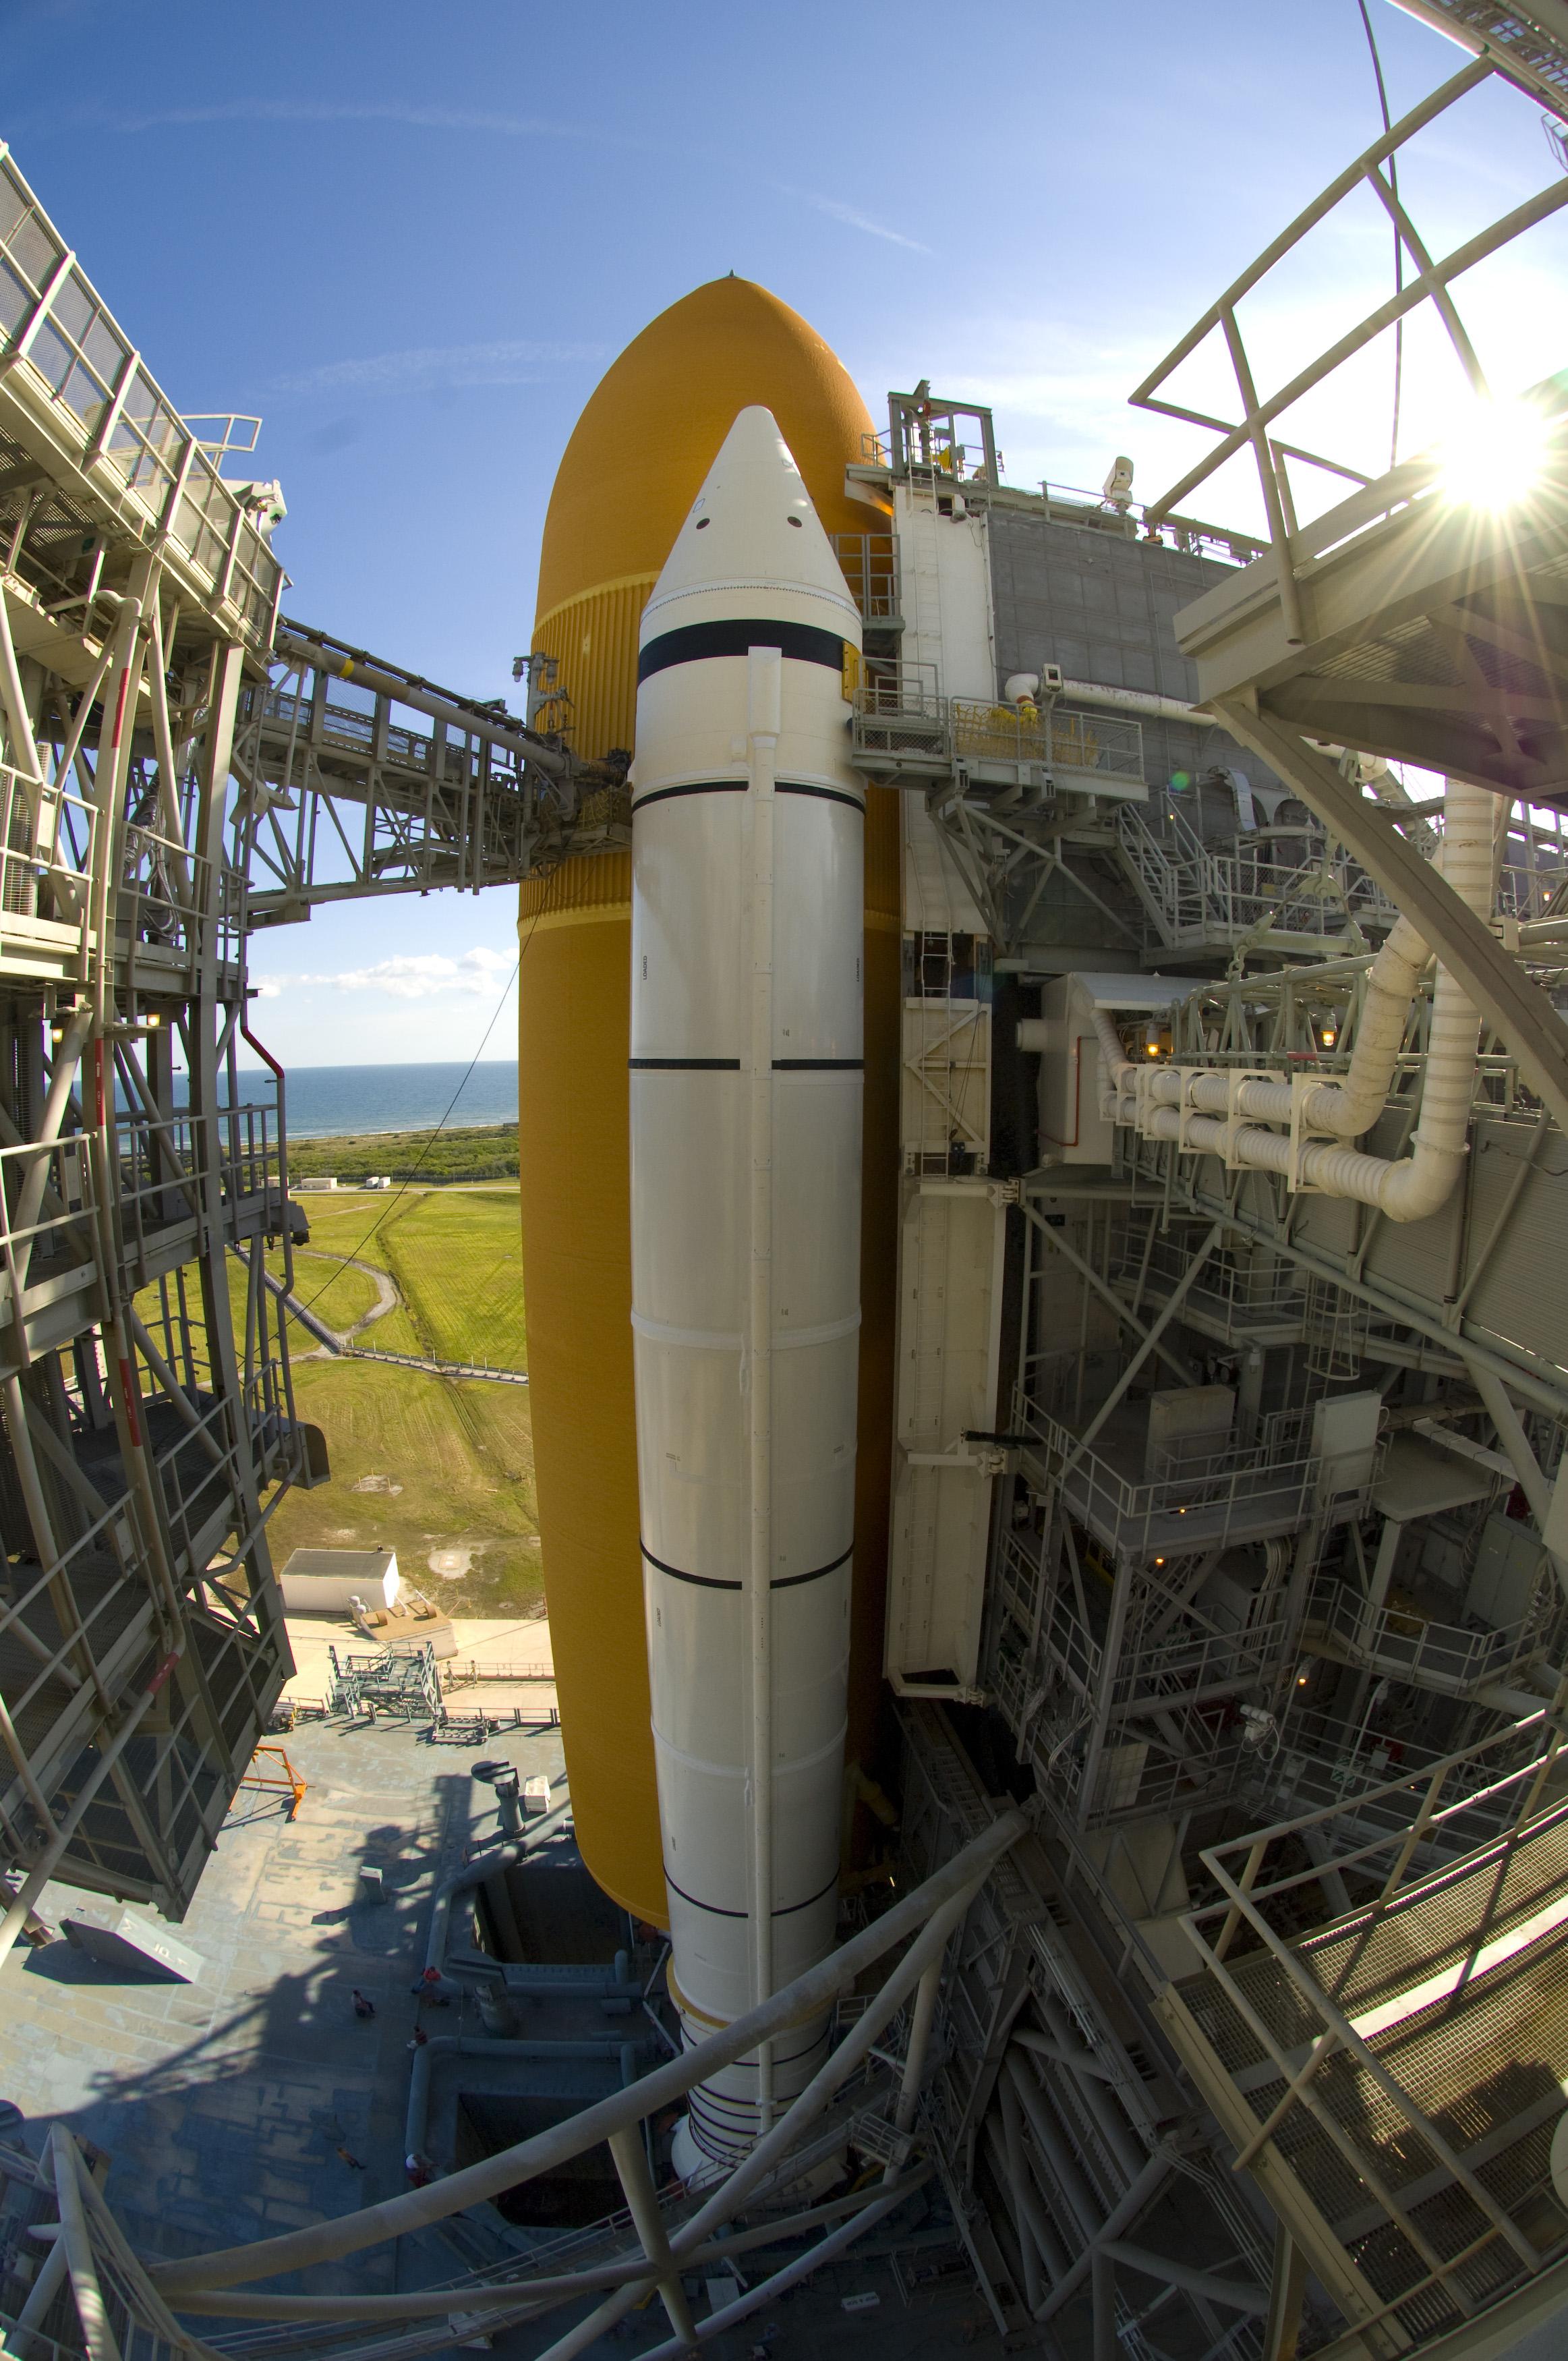 space shuttle atlantis mission - photo #29